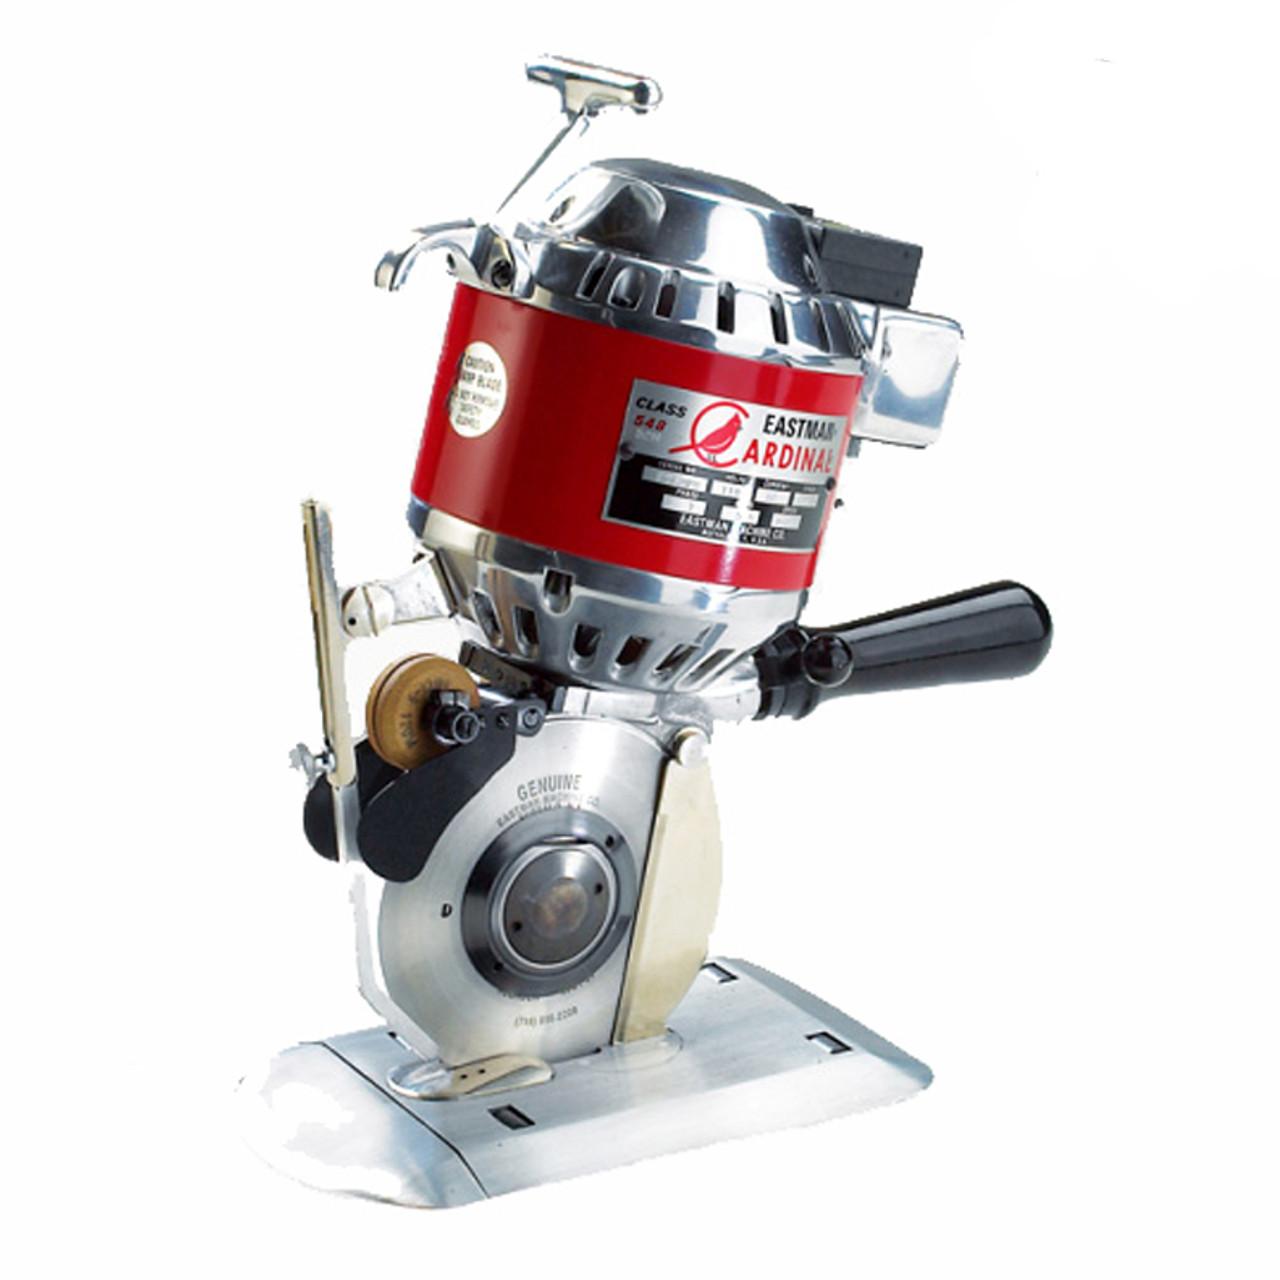 Eastman 548-52H Cutting Machine